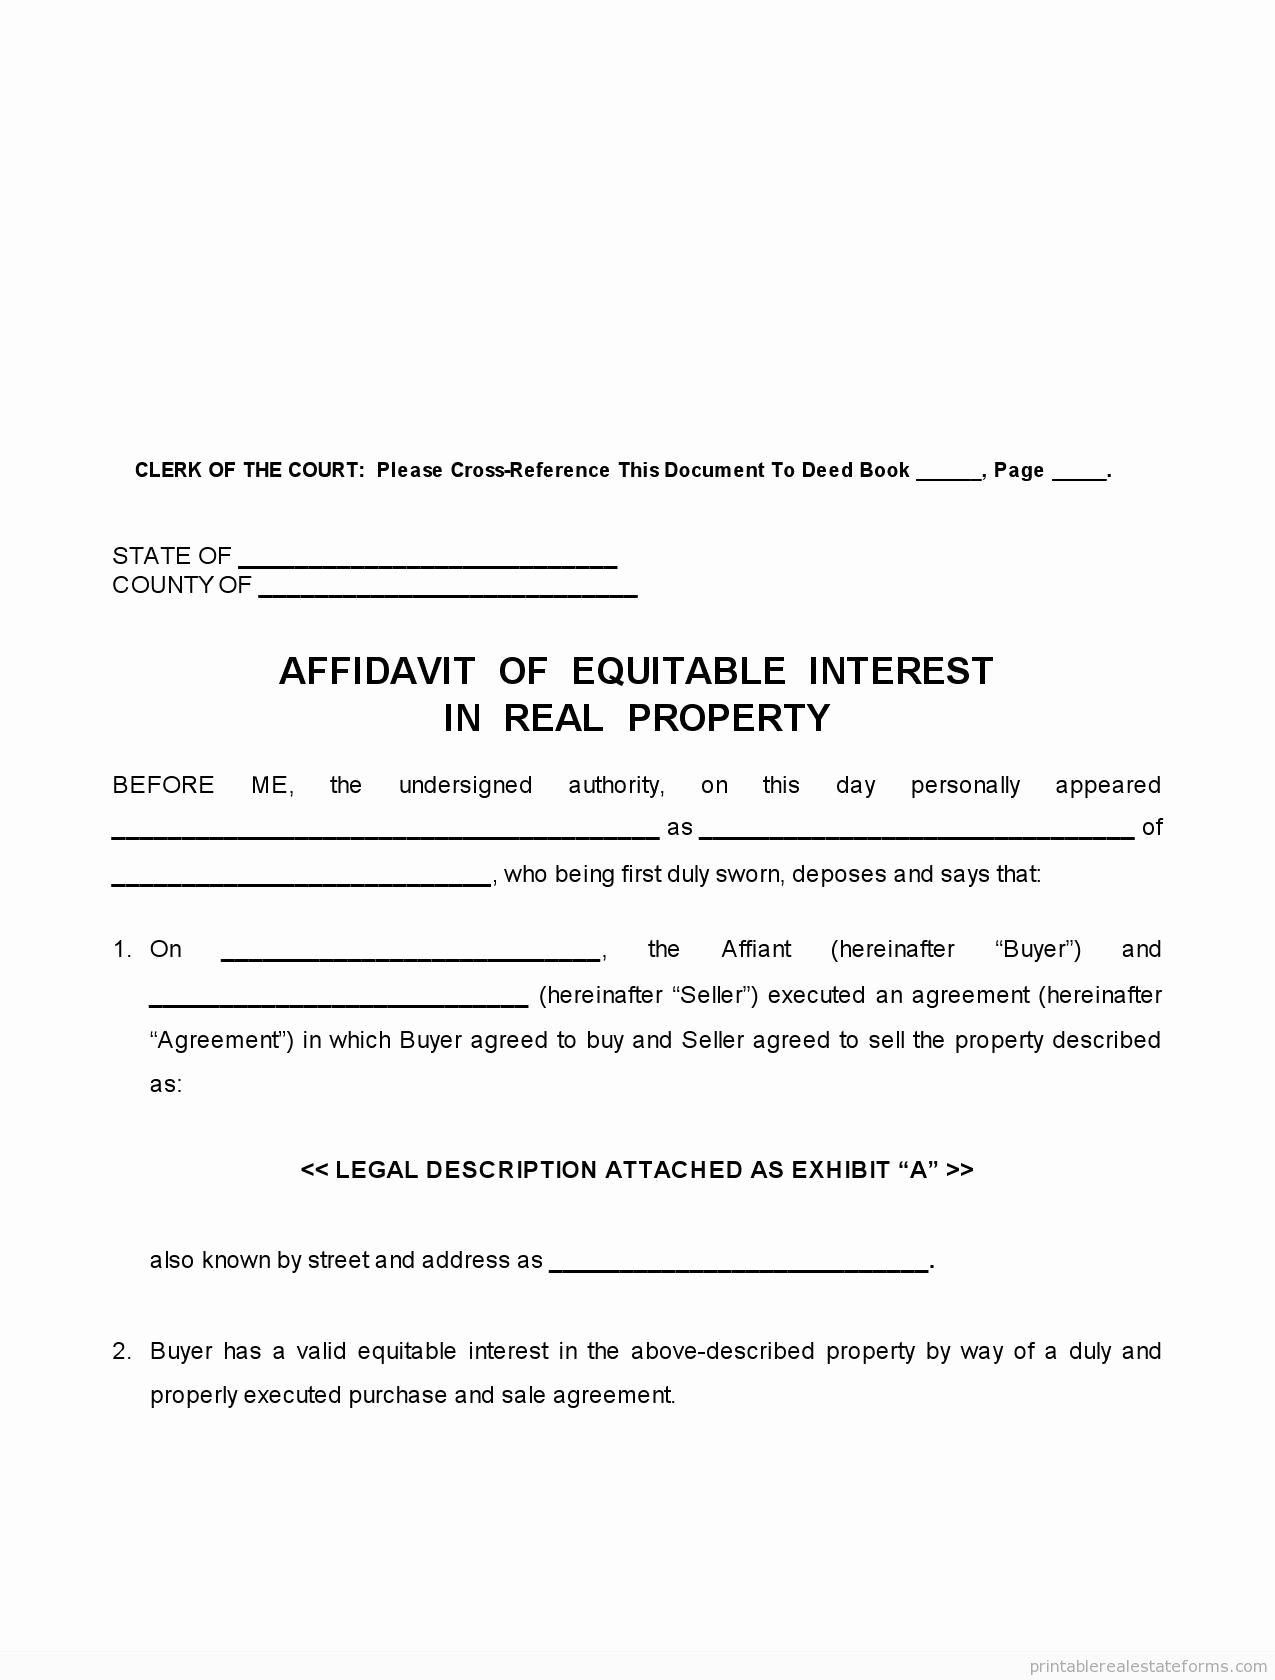 Affidavit Of assignment Luxury Affidavit Equitable Interest form Free Printable